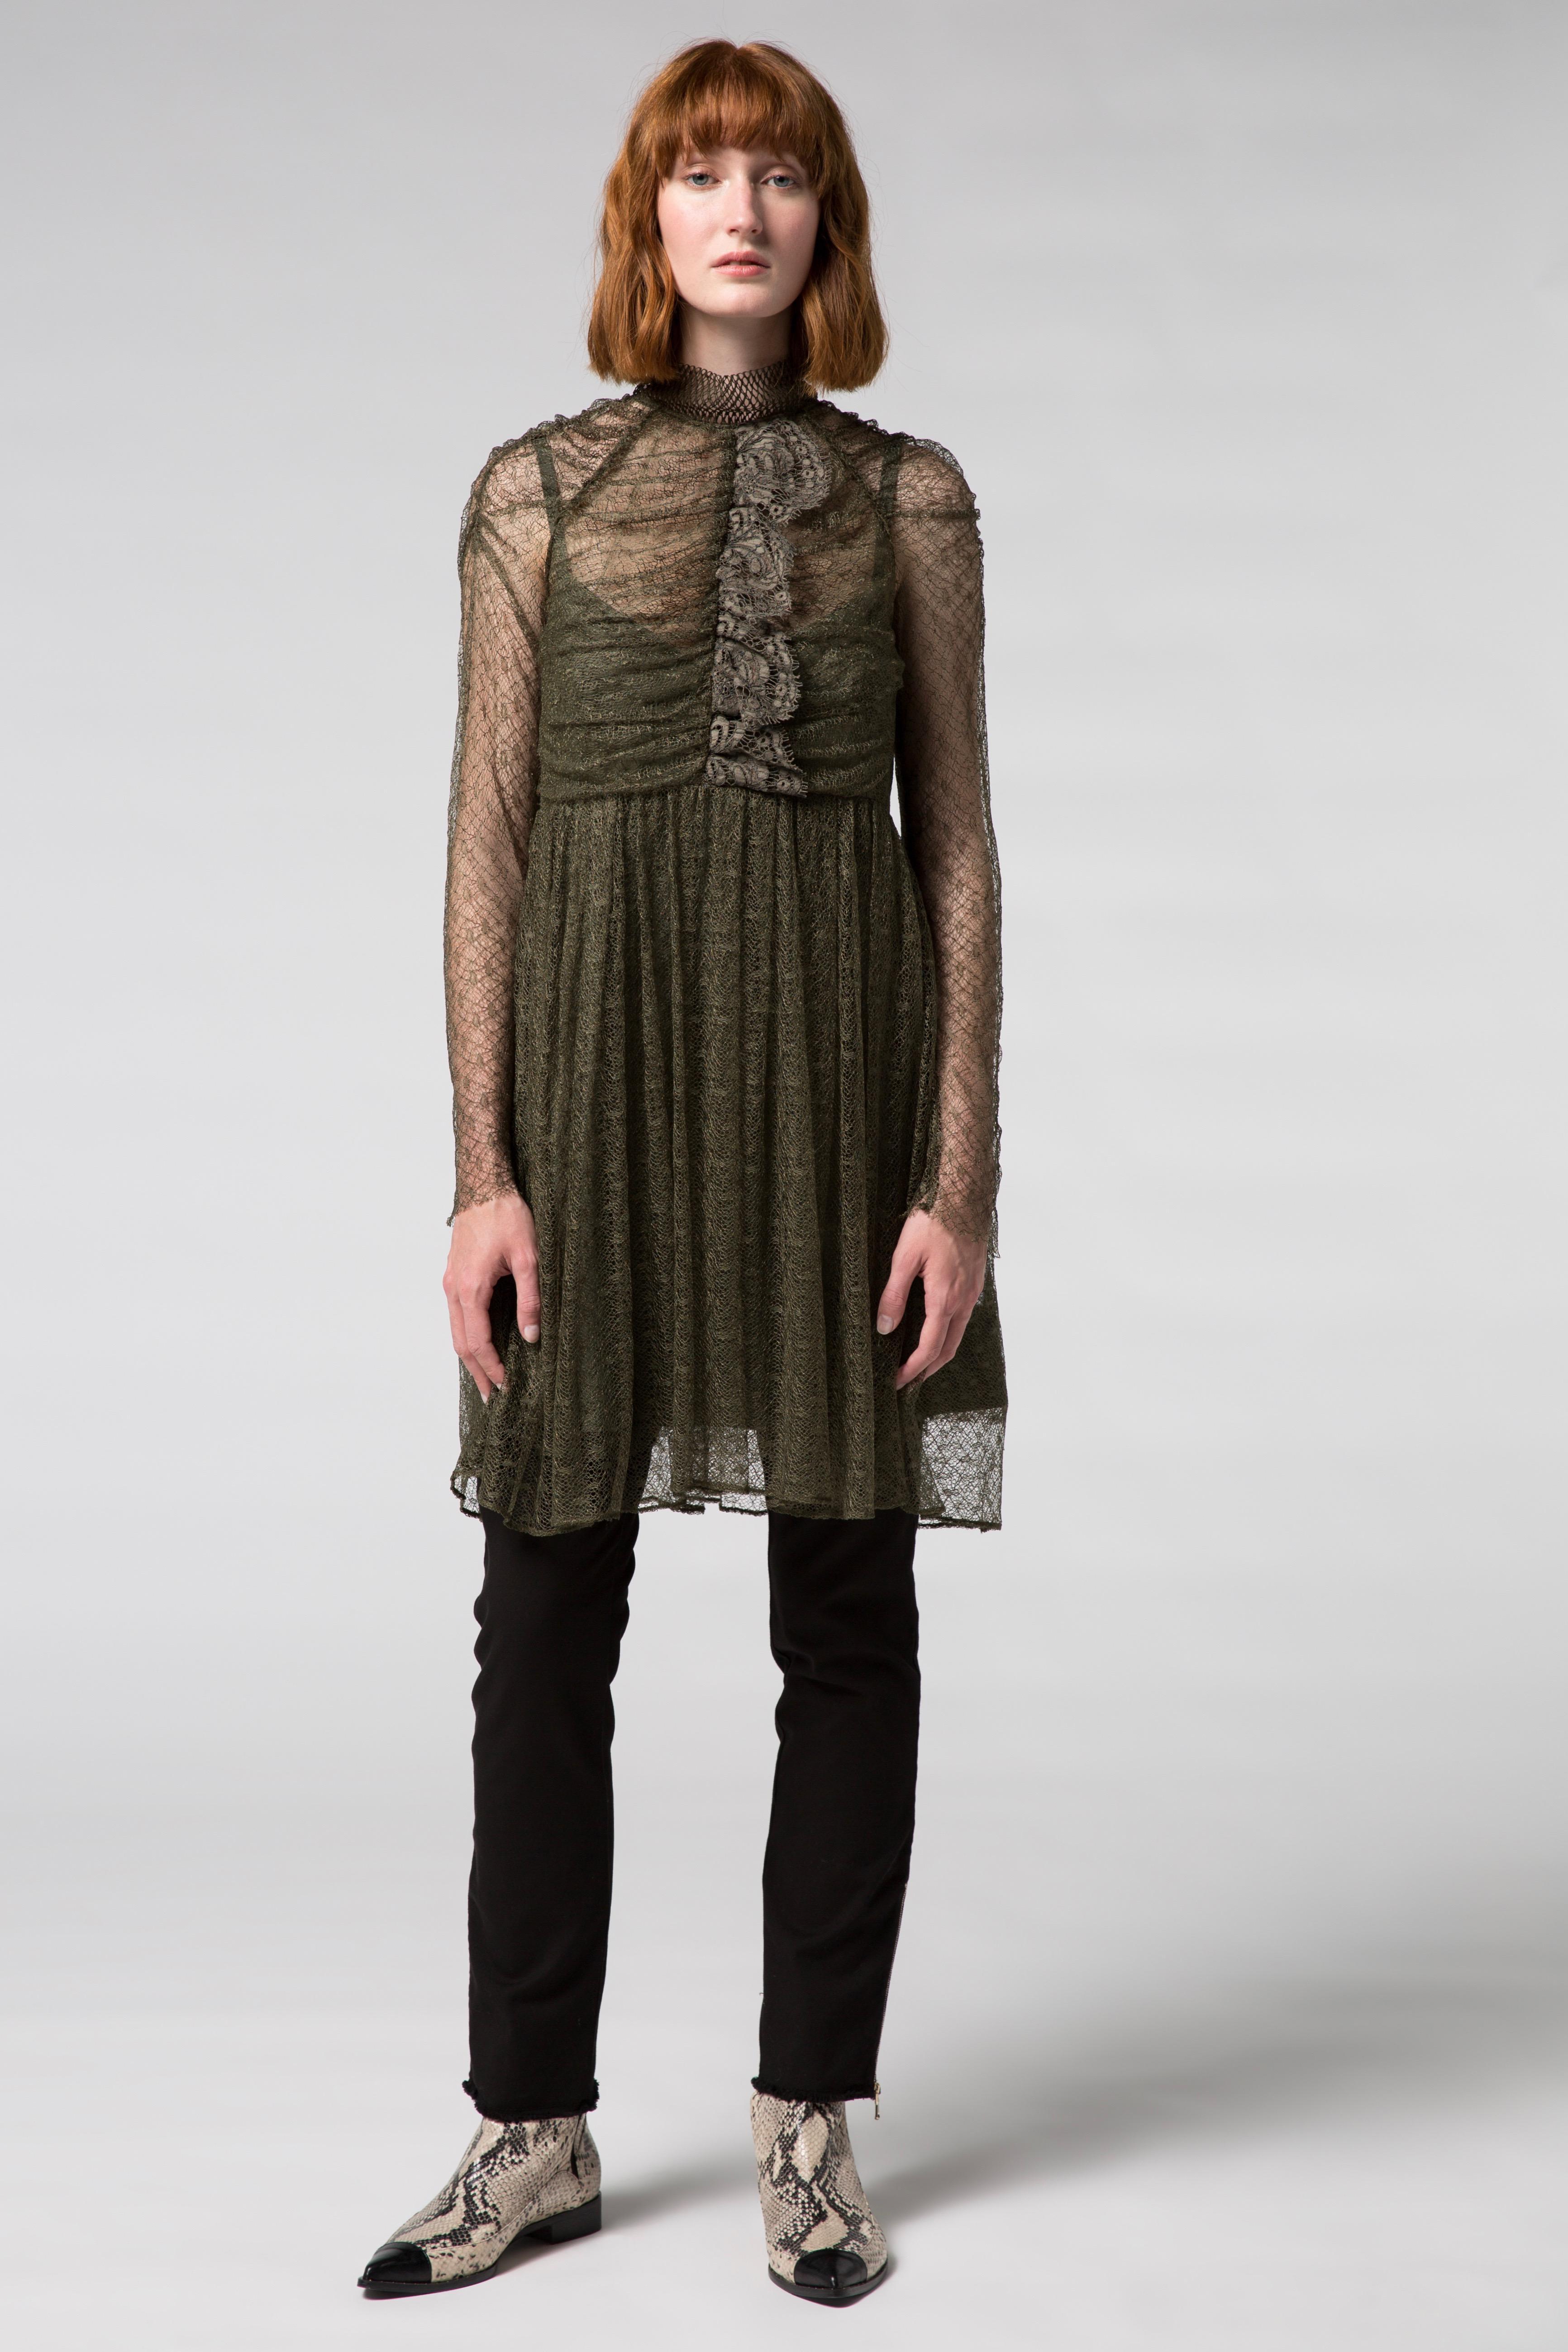 SOFT SEDUCTION dress 2 Dorothee Schumacher Pmdpf